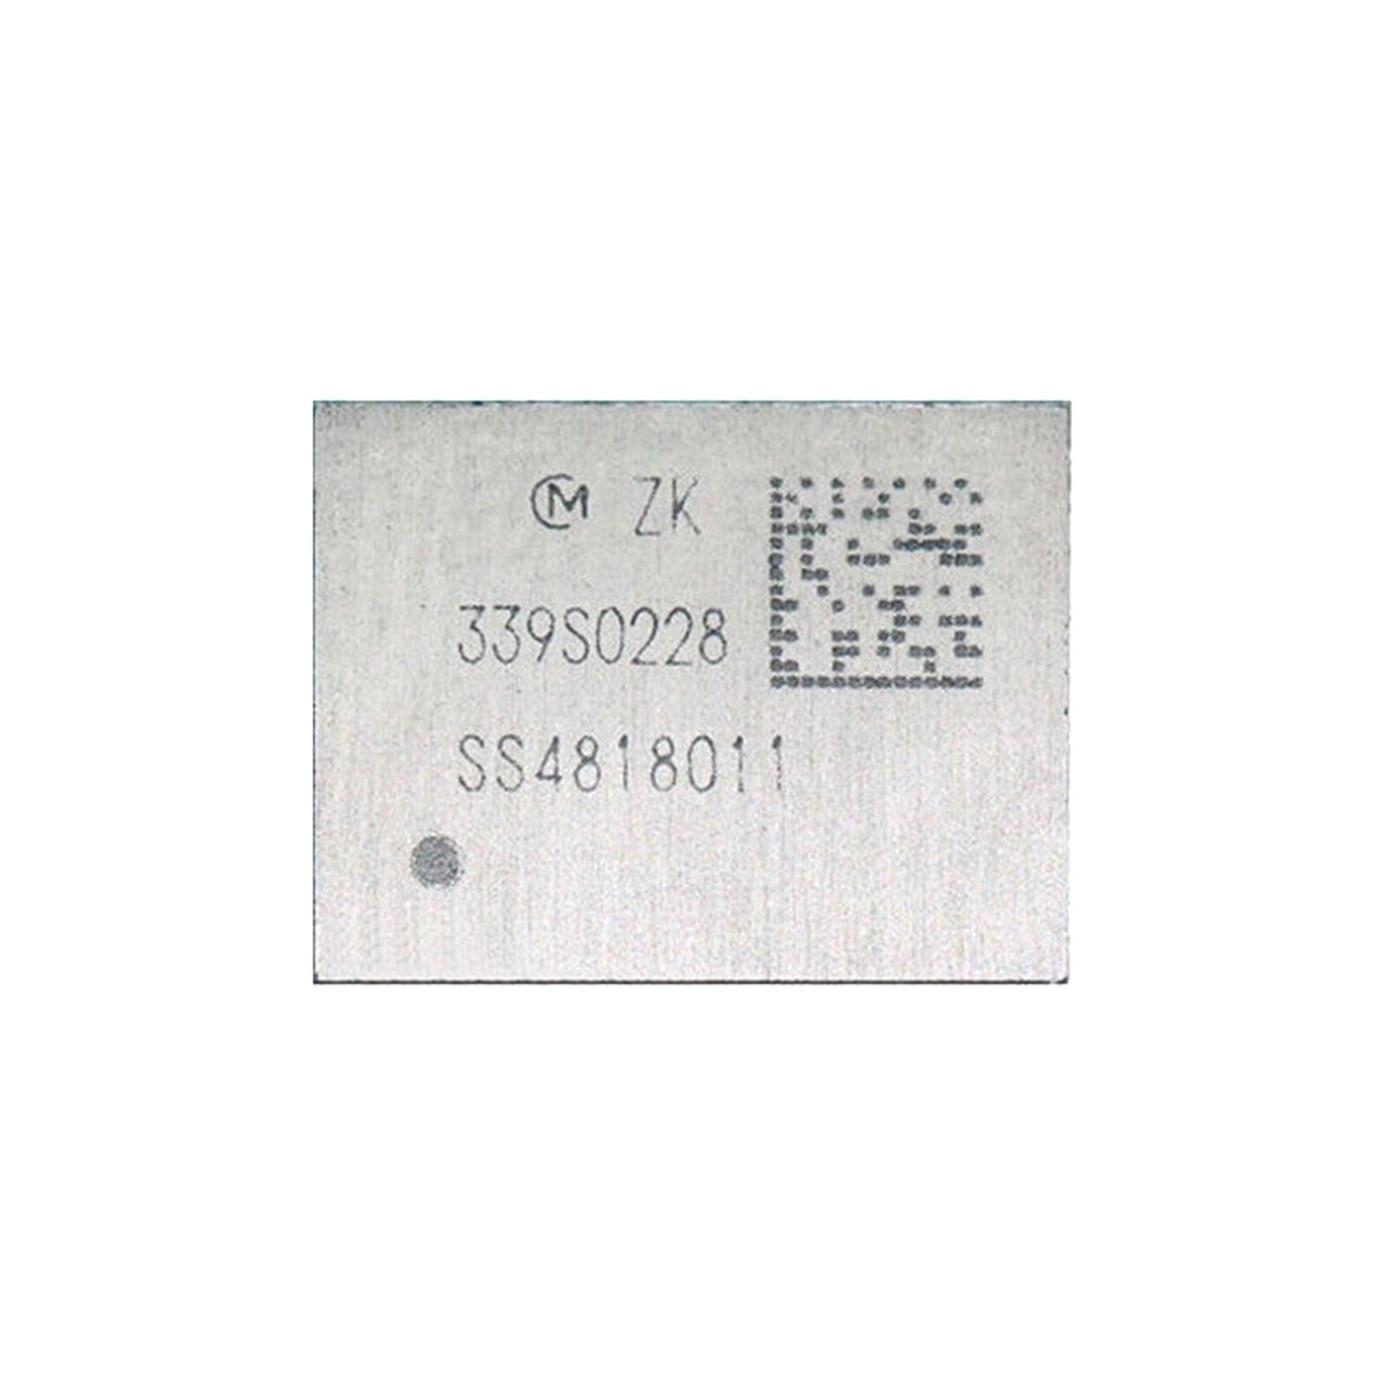 IC Chip WIFI BLUETOOTH IC 339S0228 U5201_RF para Iphone 6 - 6 PLUS